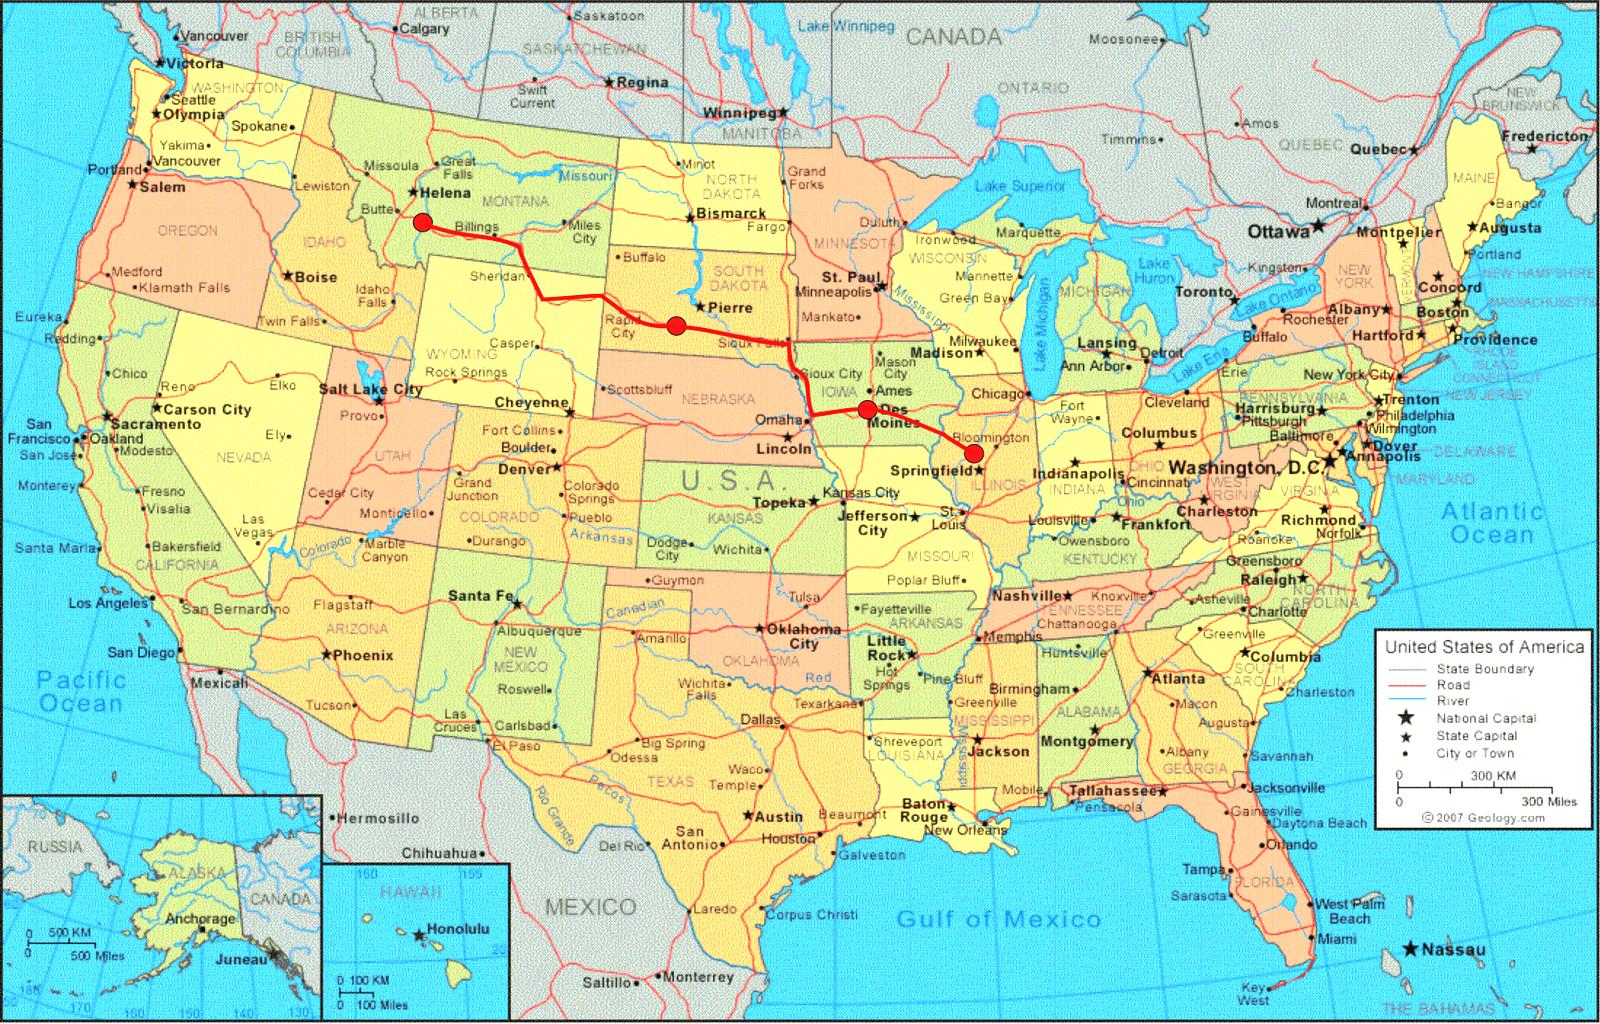 Mapa Florida Usa Google Maps #897741 - Maps Google Florida Usa